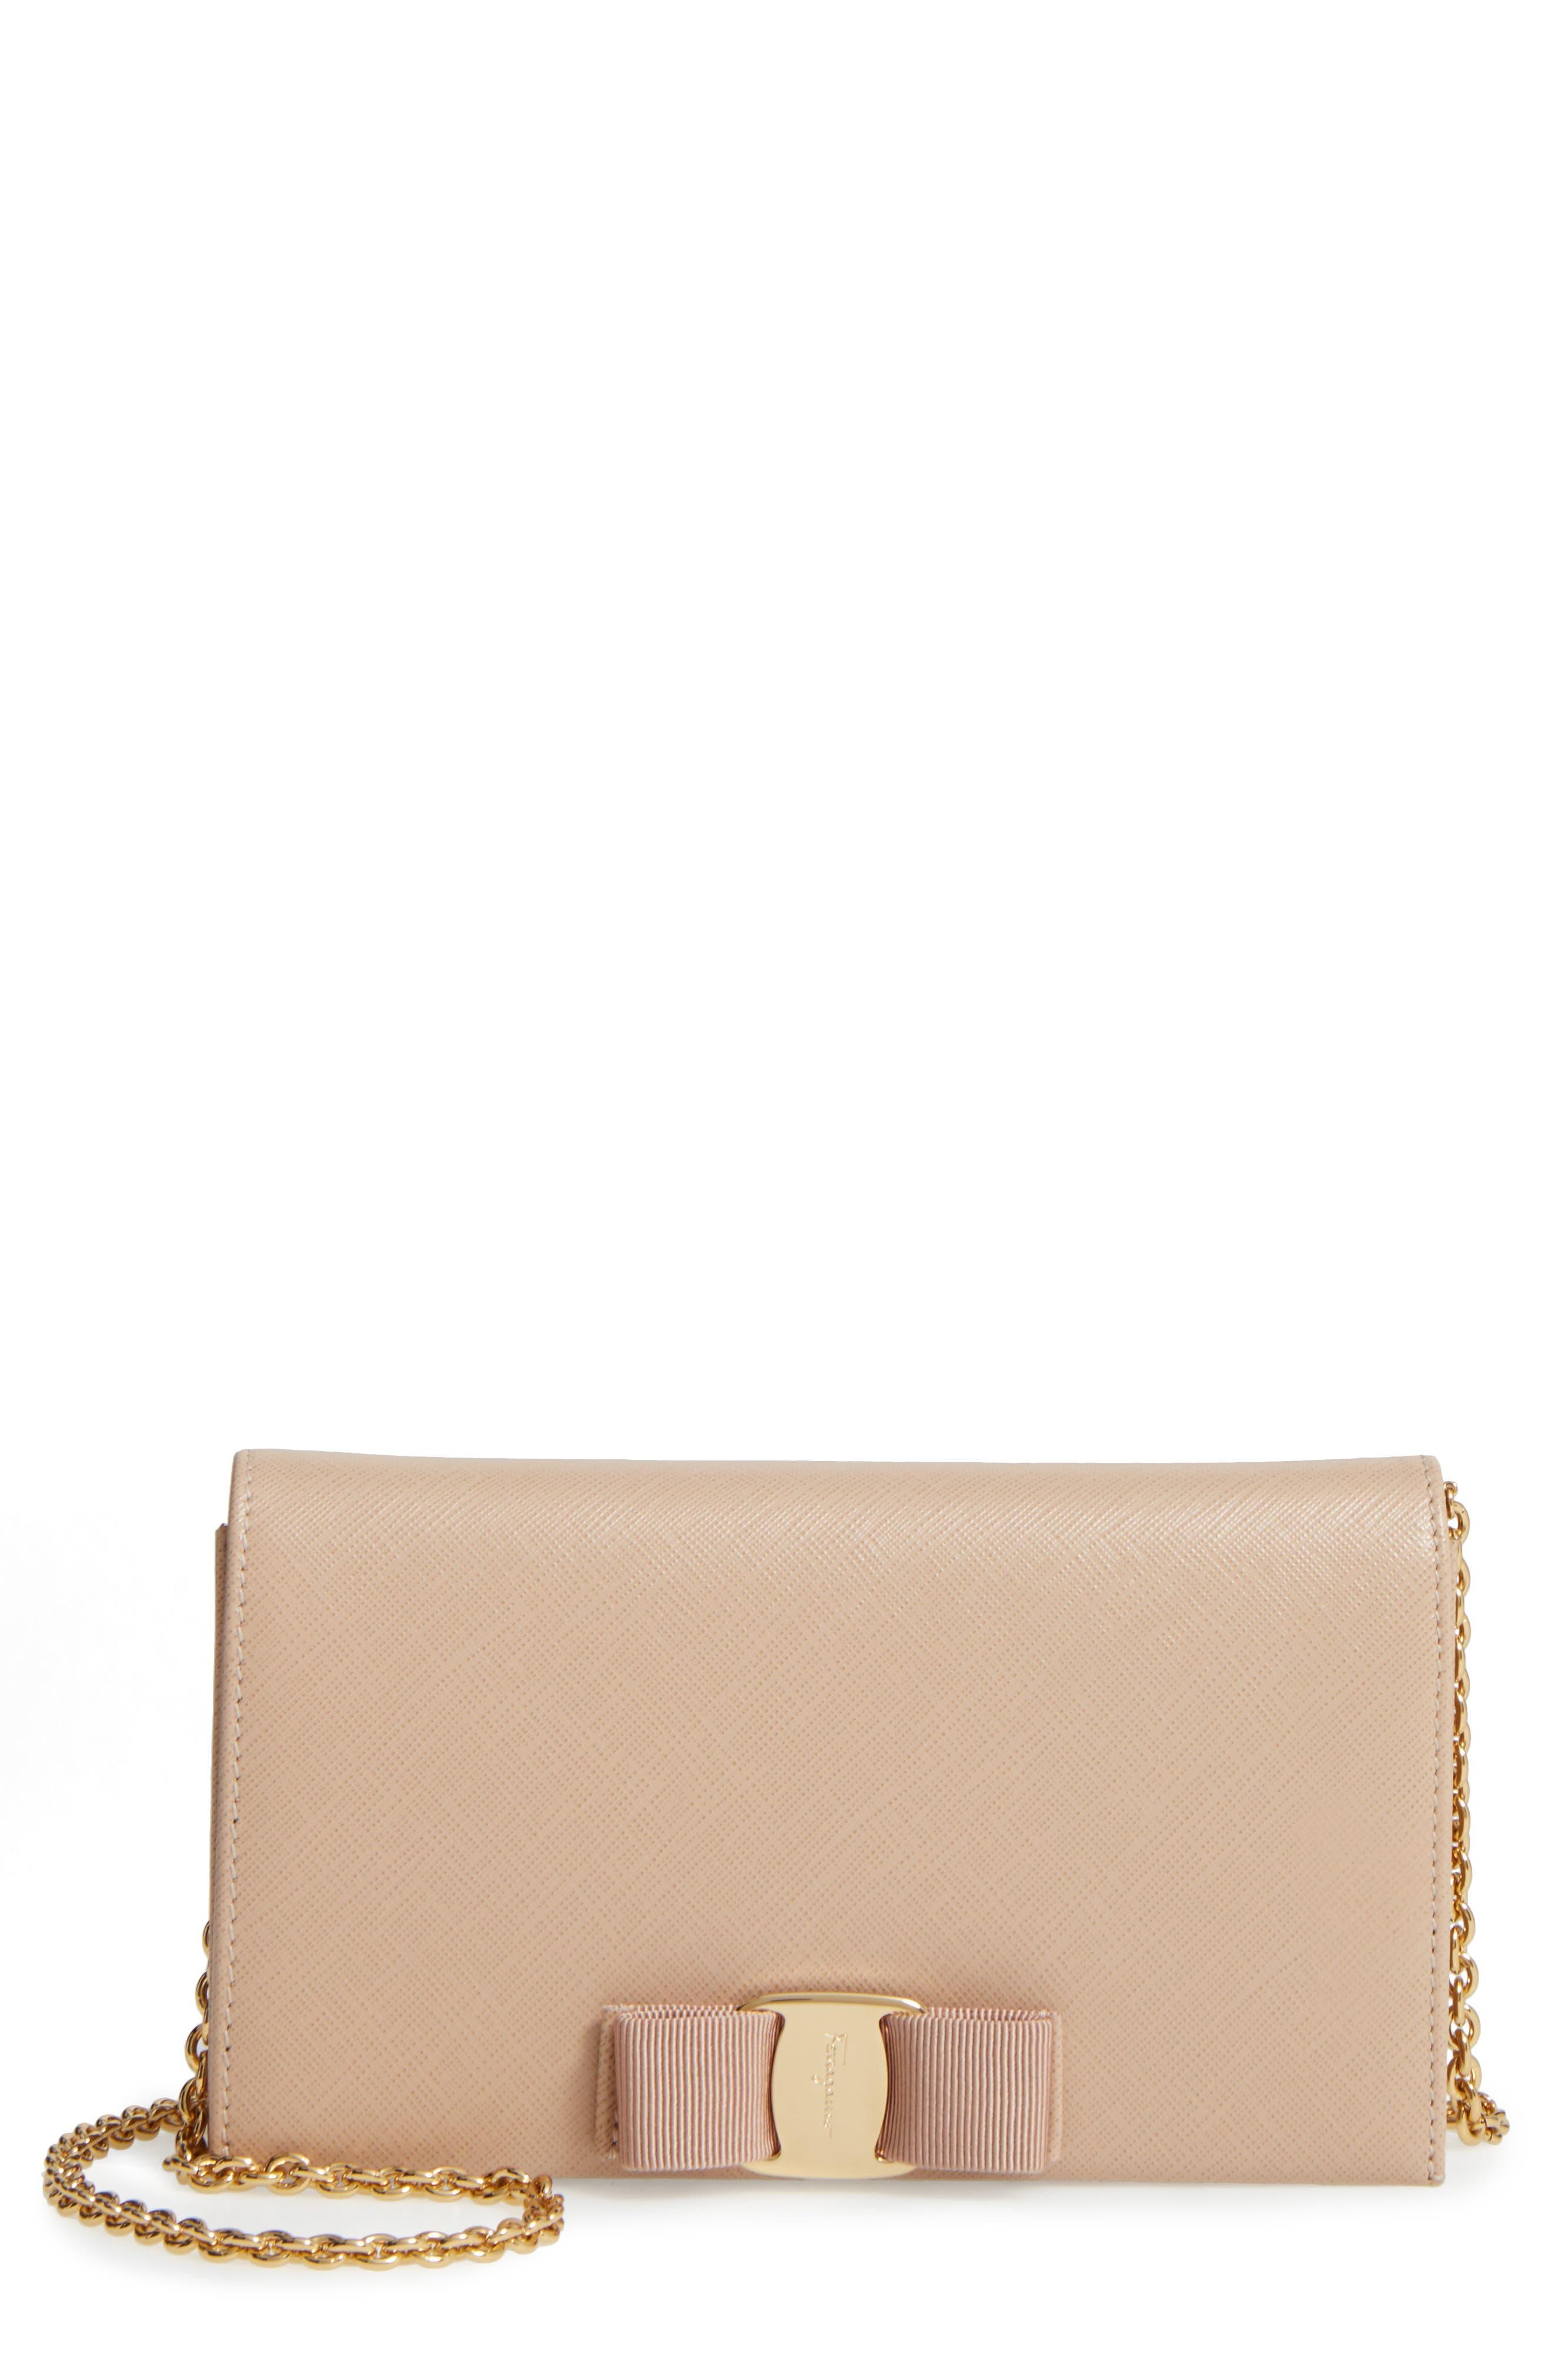 Salavatore Ferragamo 'Miss Vara' Leather Wallet on a Chain